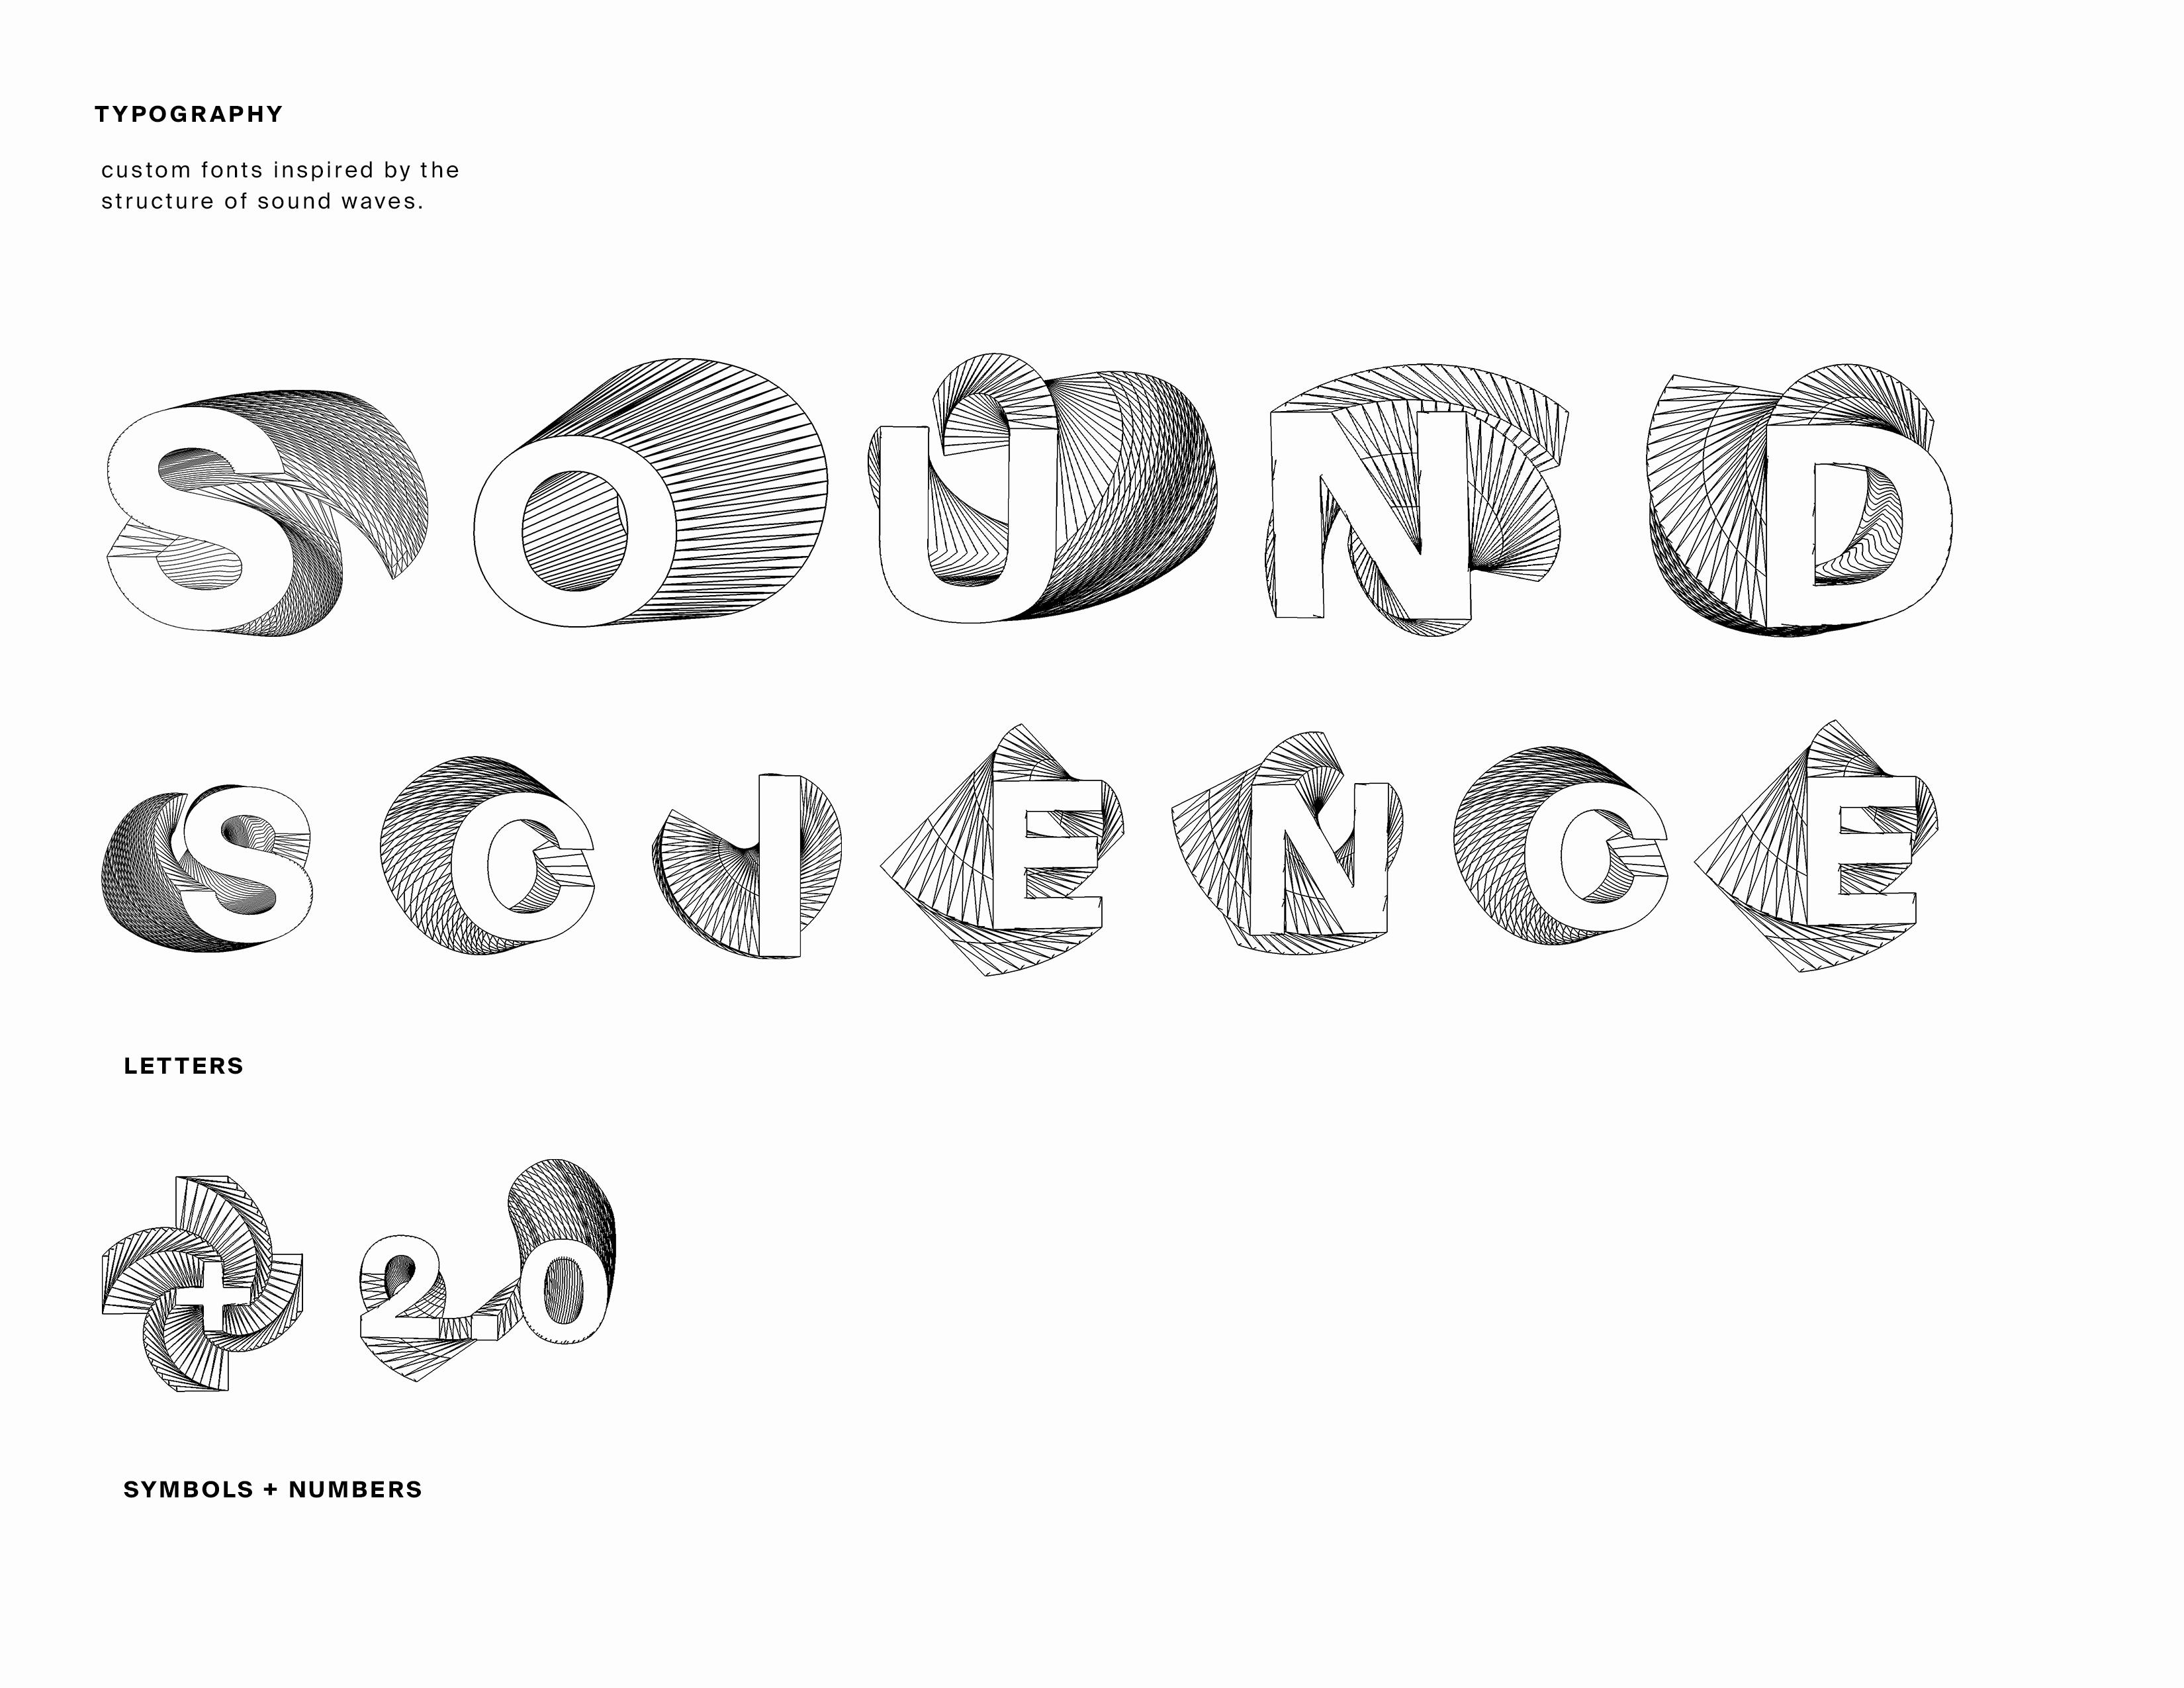 Science + Sound 2 0 - Michelle Wu